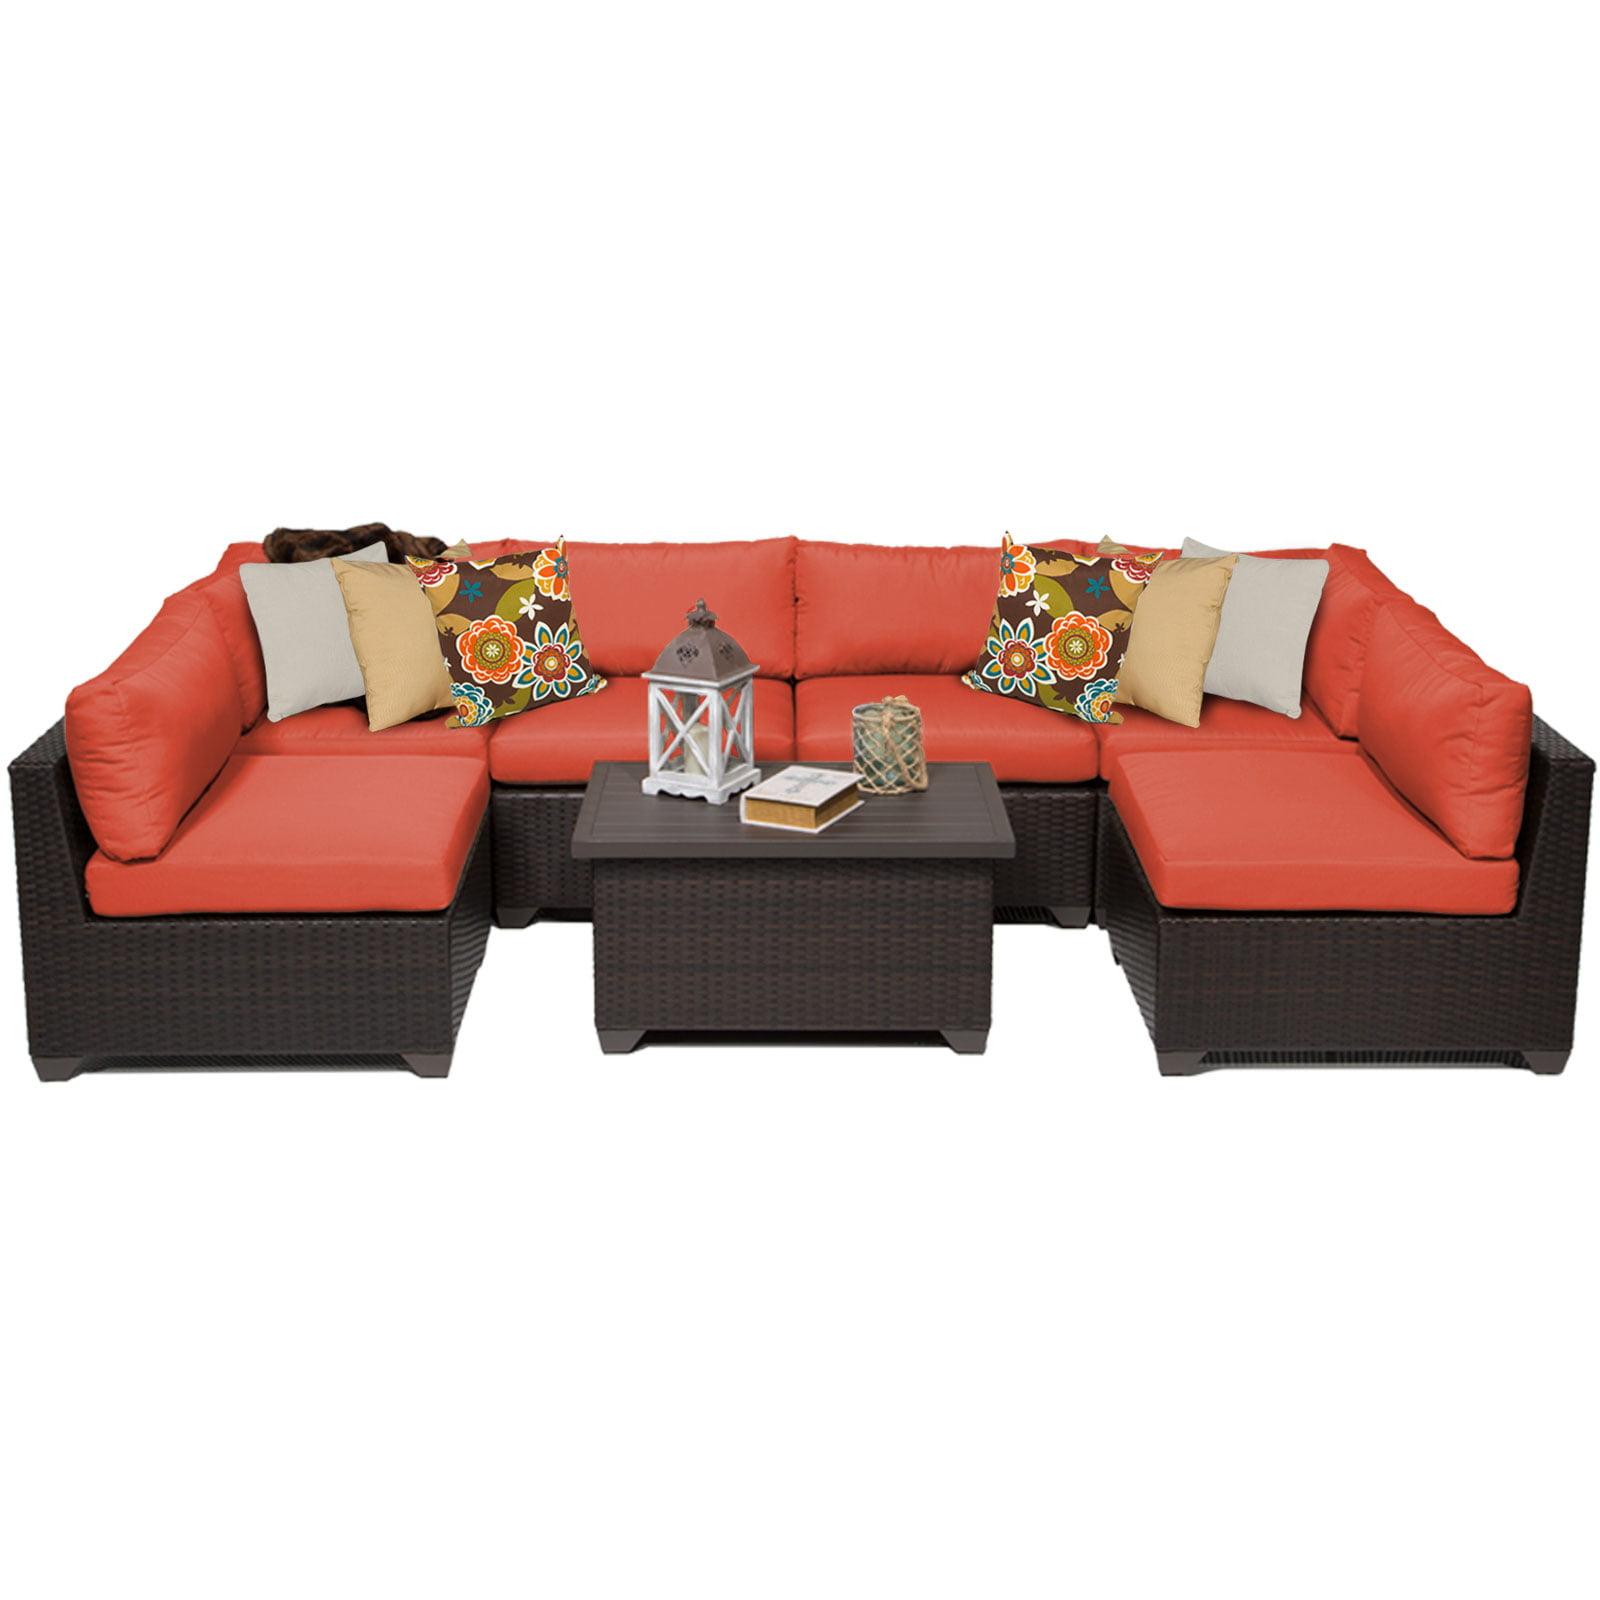 Premier 7 Piece Outdoor Wicker Patio Furniture Set 07a